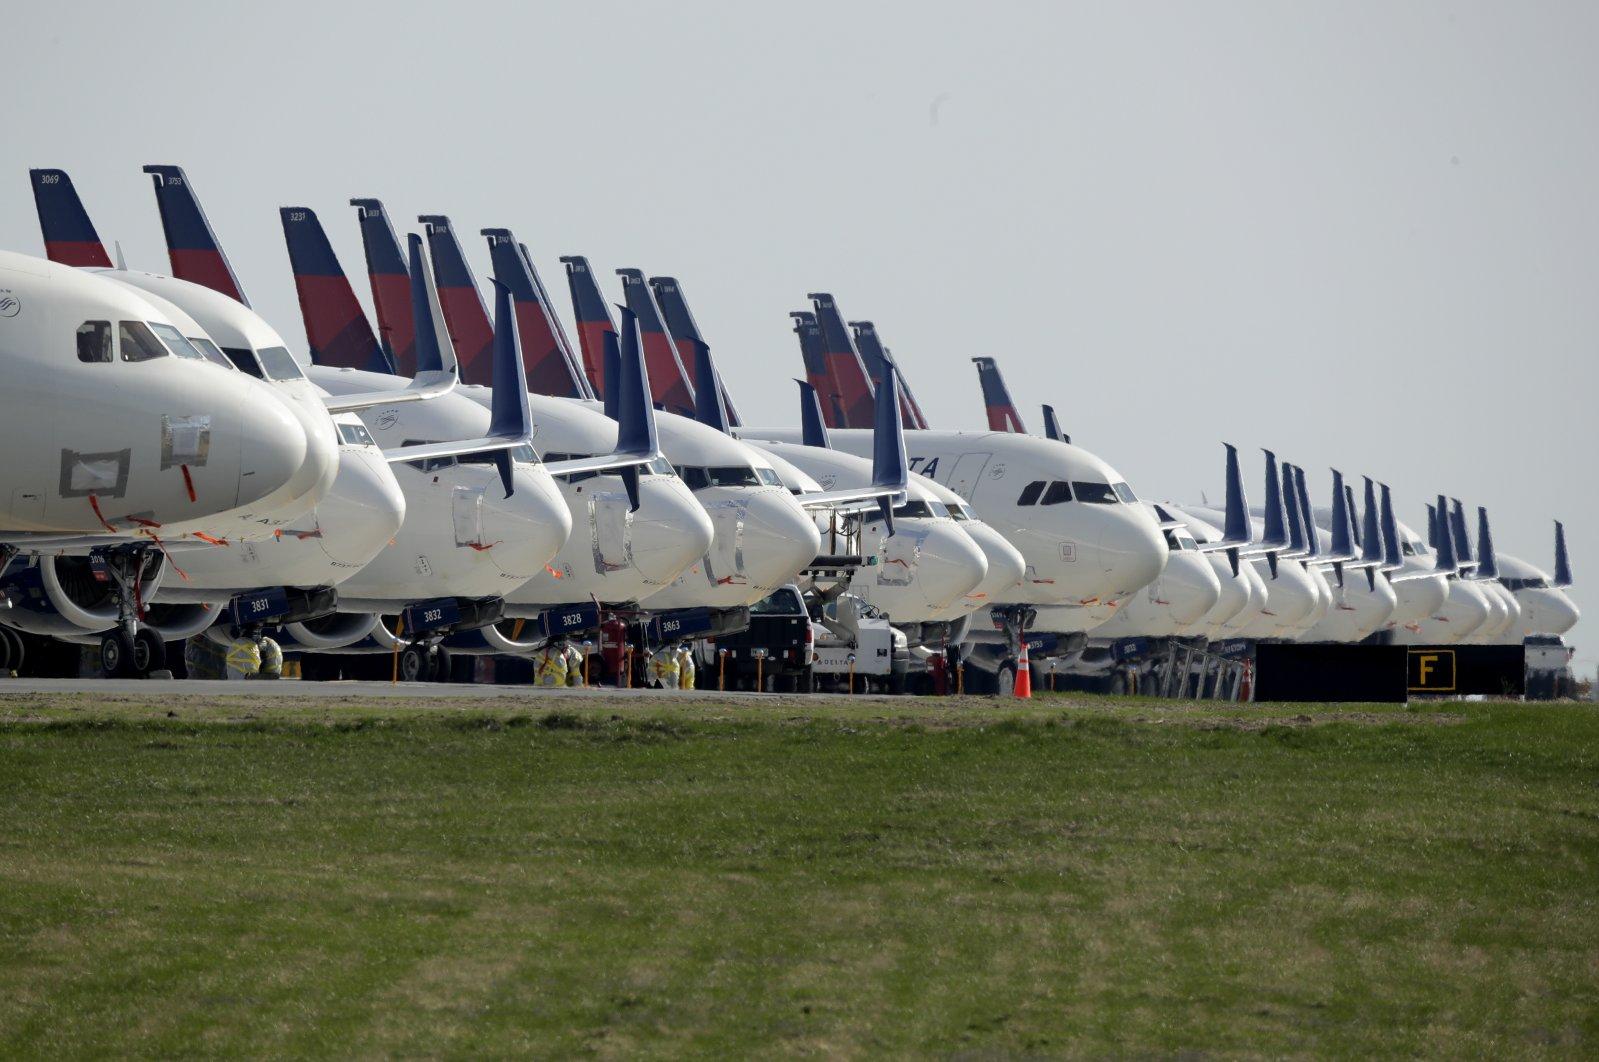 Several dozen mothballed Delta Air Lines jets are parked at Kansas City International Airport in Kansas City, Mo., April 1, 2020. (AP Photo)